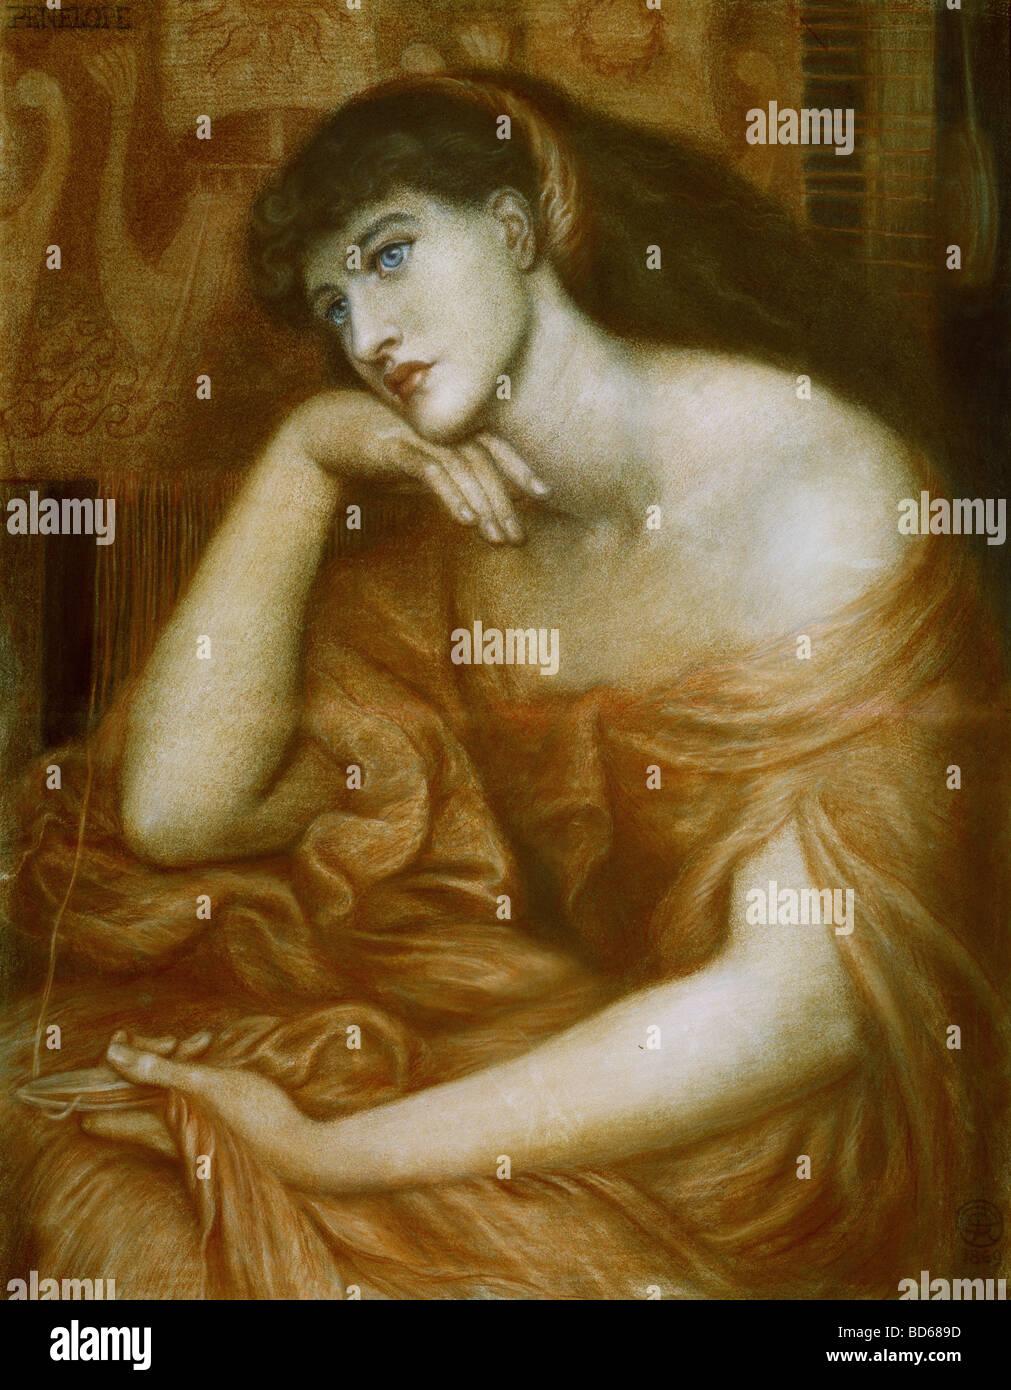 "fine arts, Rossetti, Dante Gabriel (1828 - 1882), painting, ""Penelope"", oil on canvas, 1869, symbolism, preraffaelites, Stock Photo"